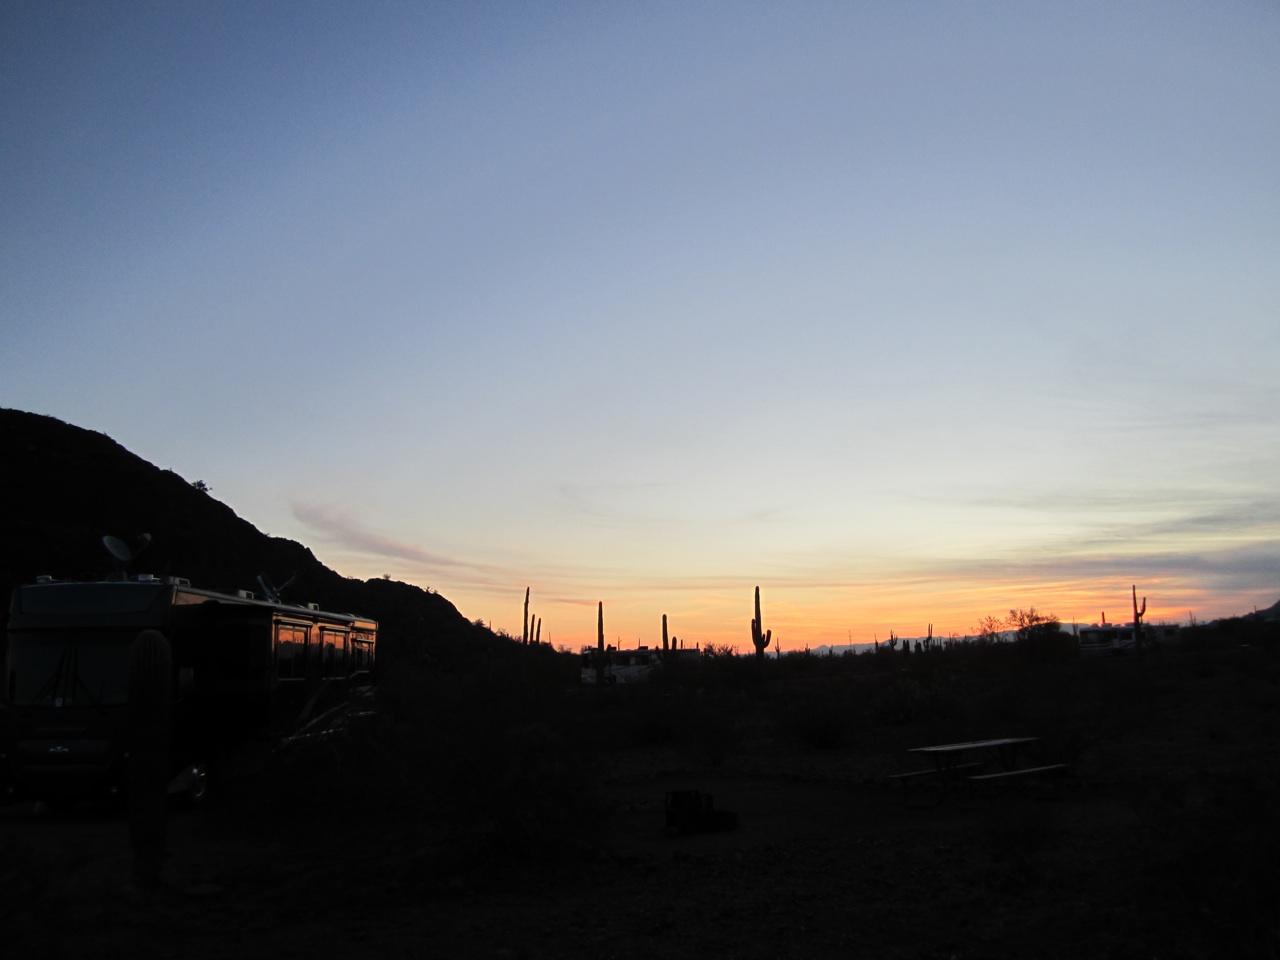 Sunrise At Picacho Peak State Park